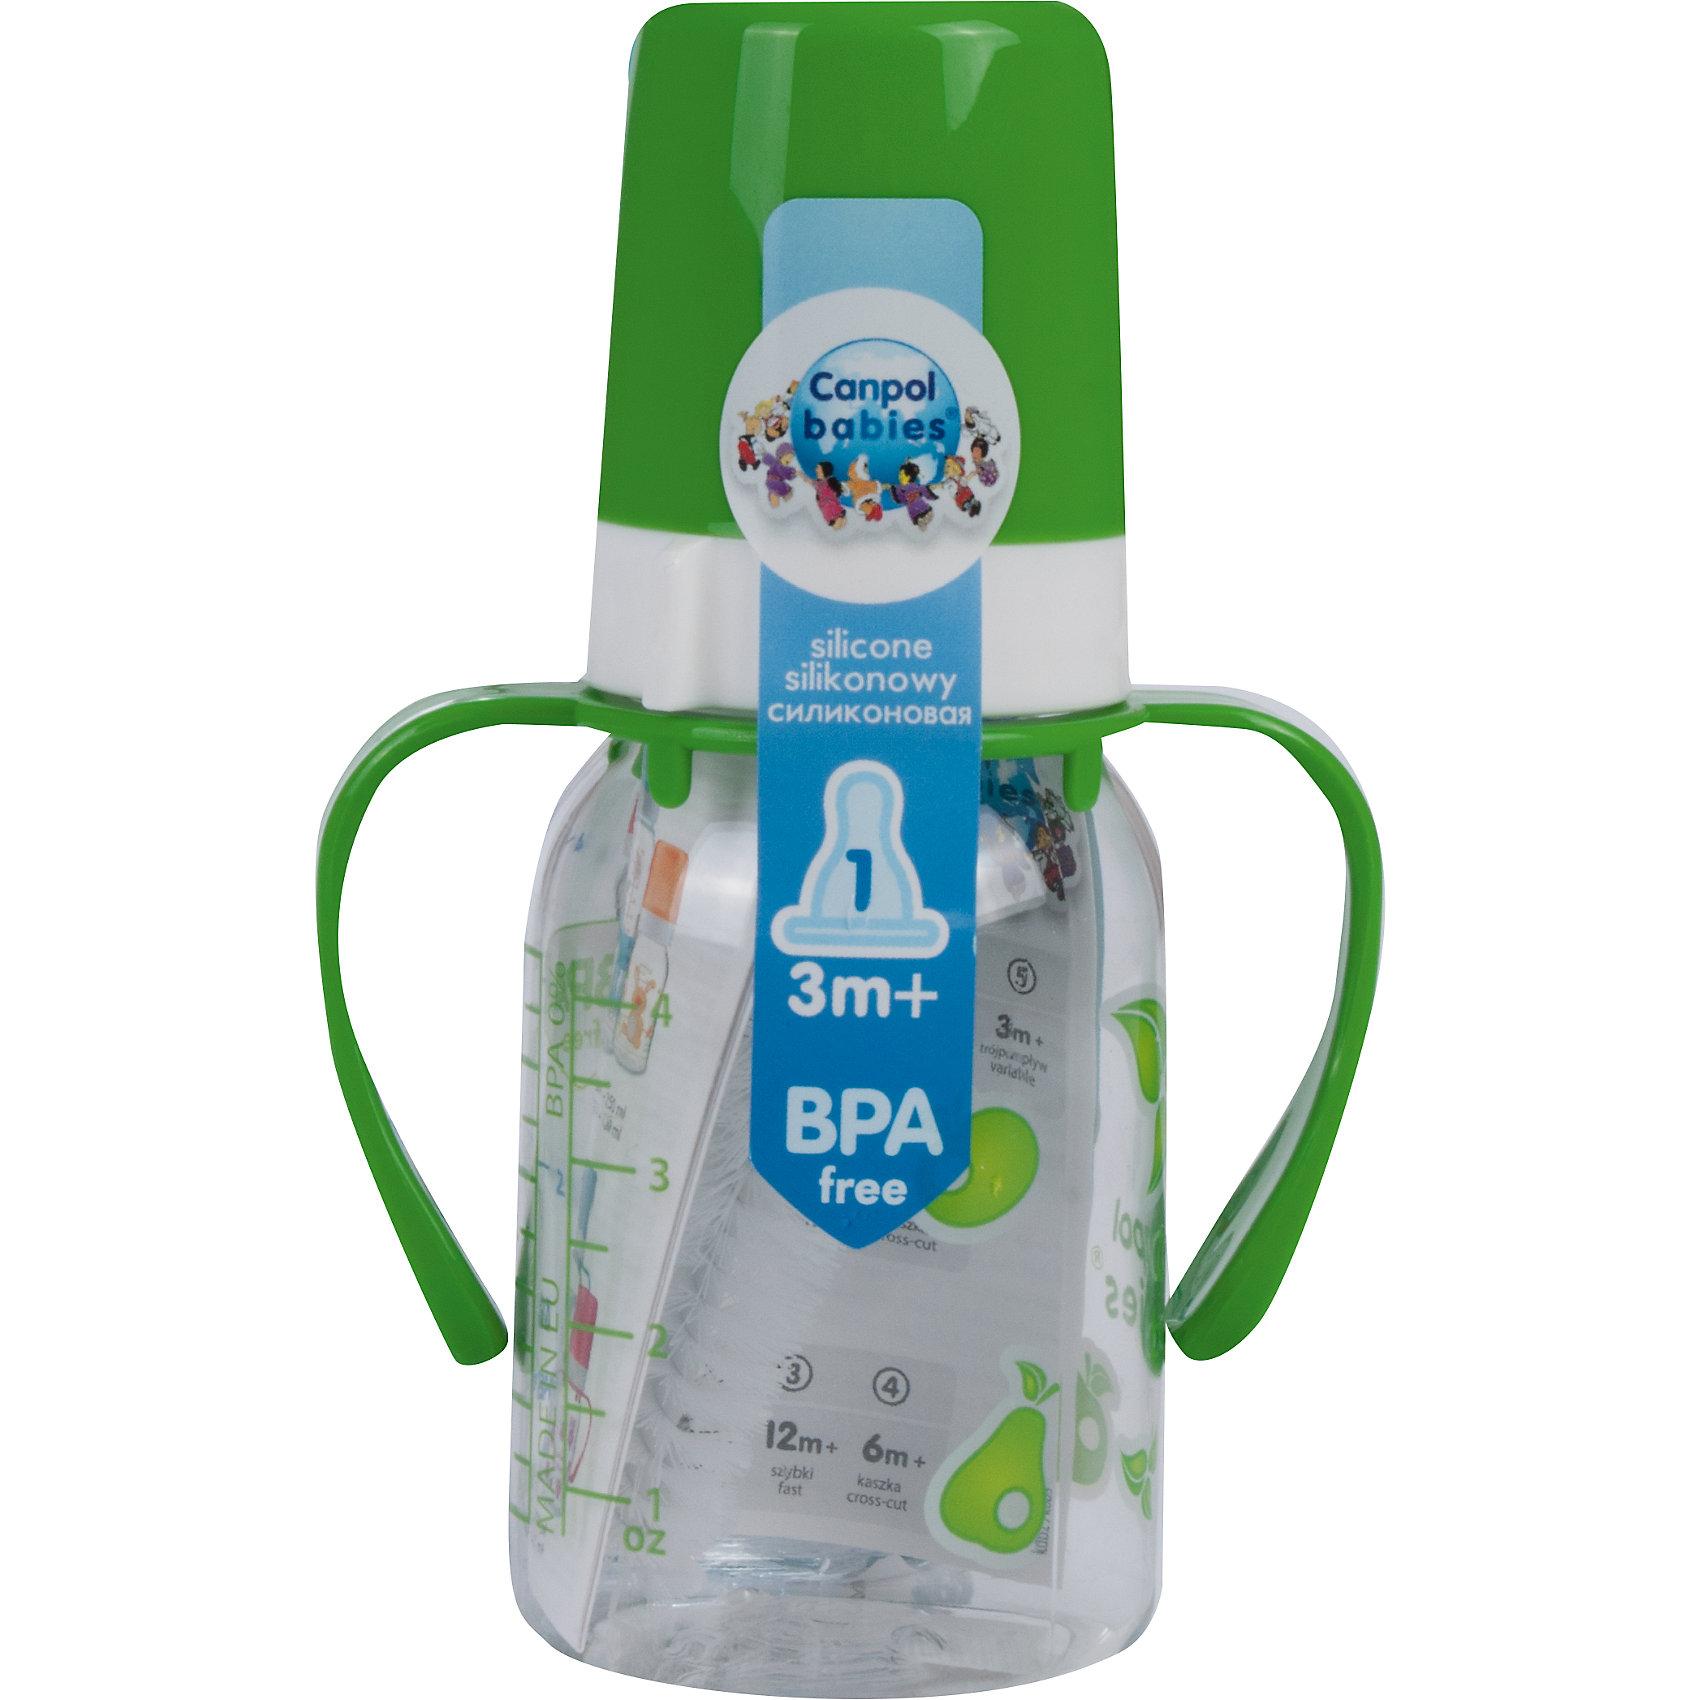 Canpol Babies Бутылочка тритановая 120 мл. 3+, Canpol Babies, зеленый canpol babies канпол бутылочка пластиковая фигурная 250мл